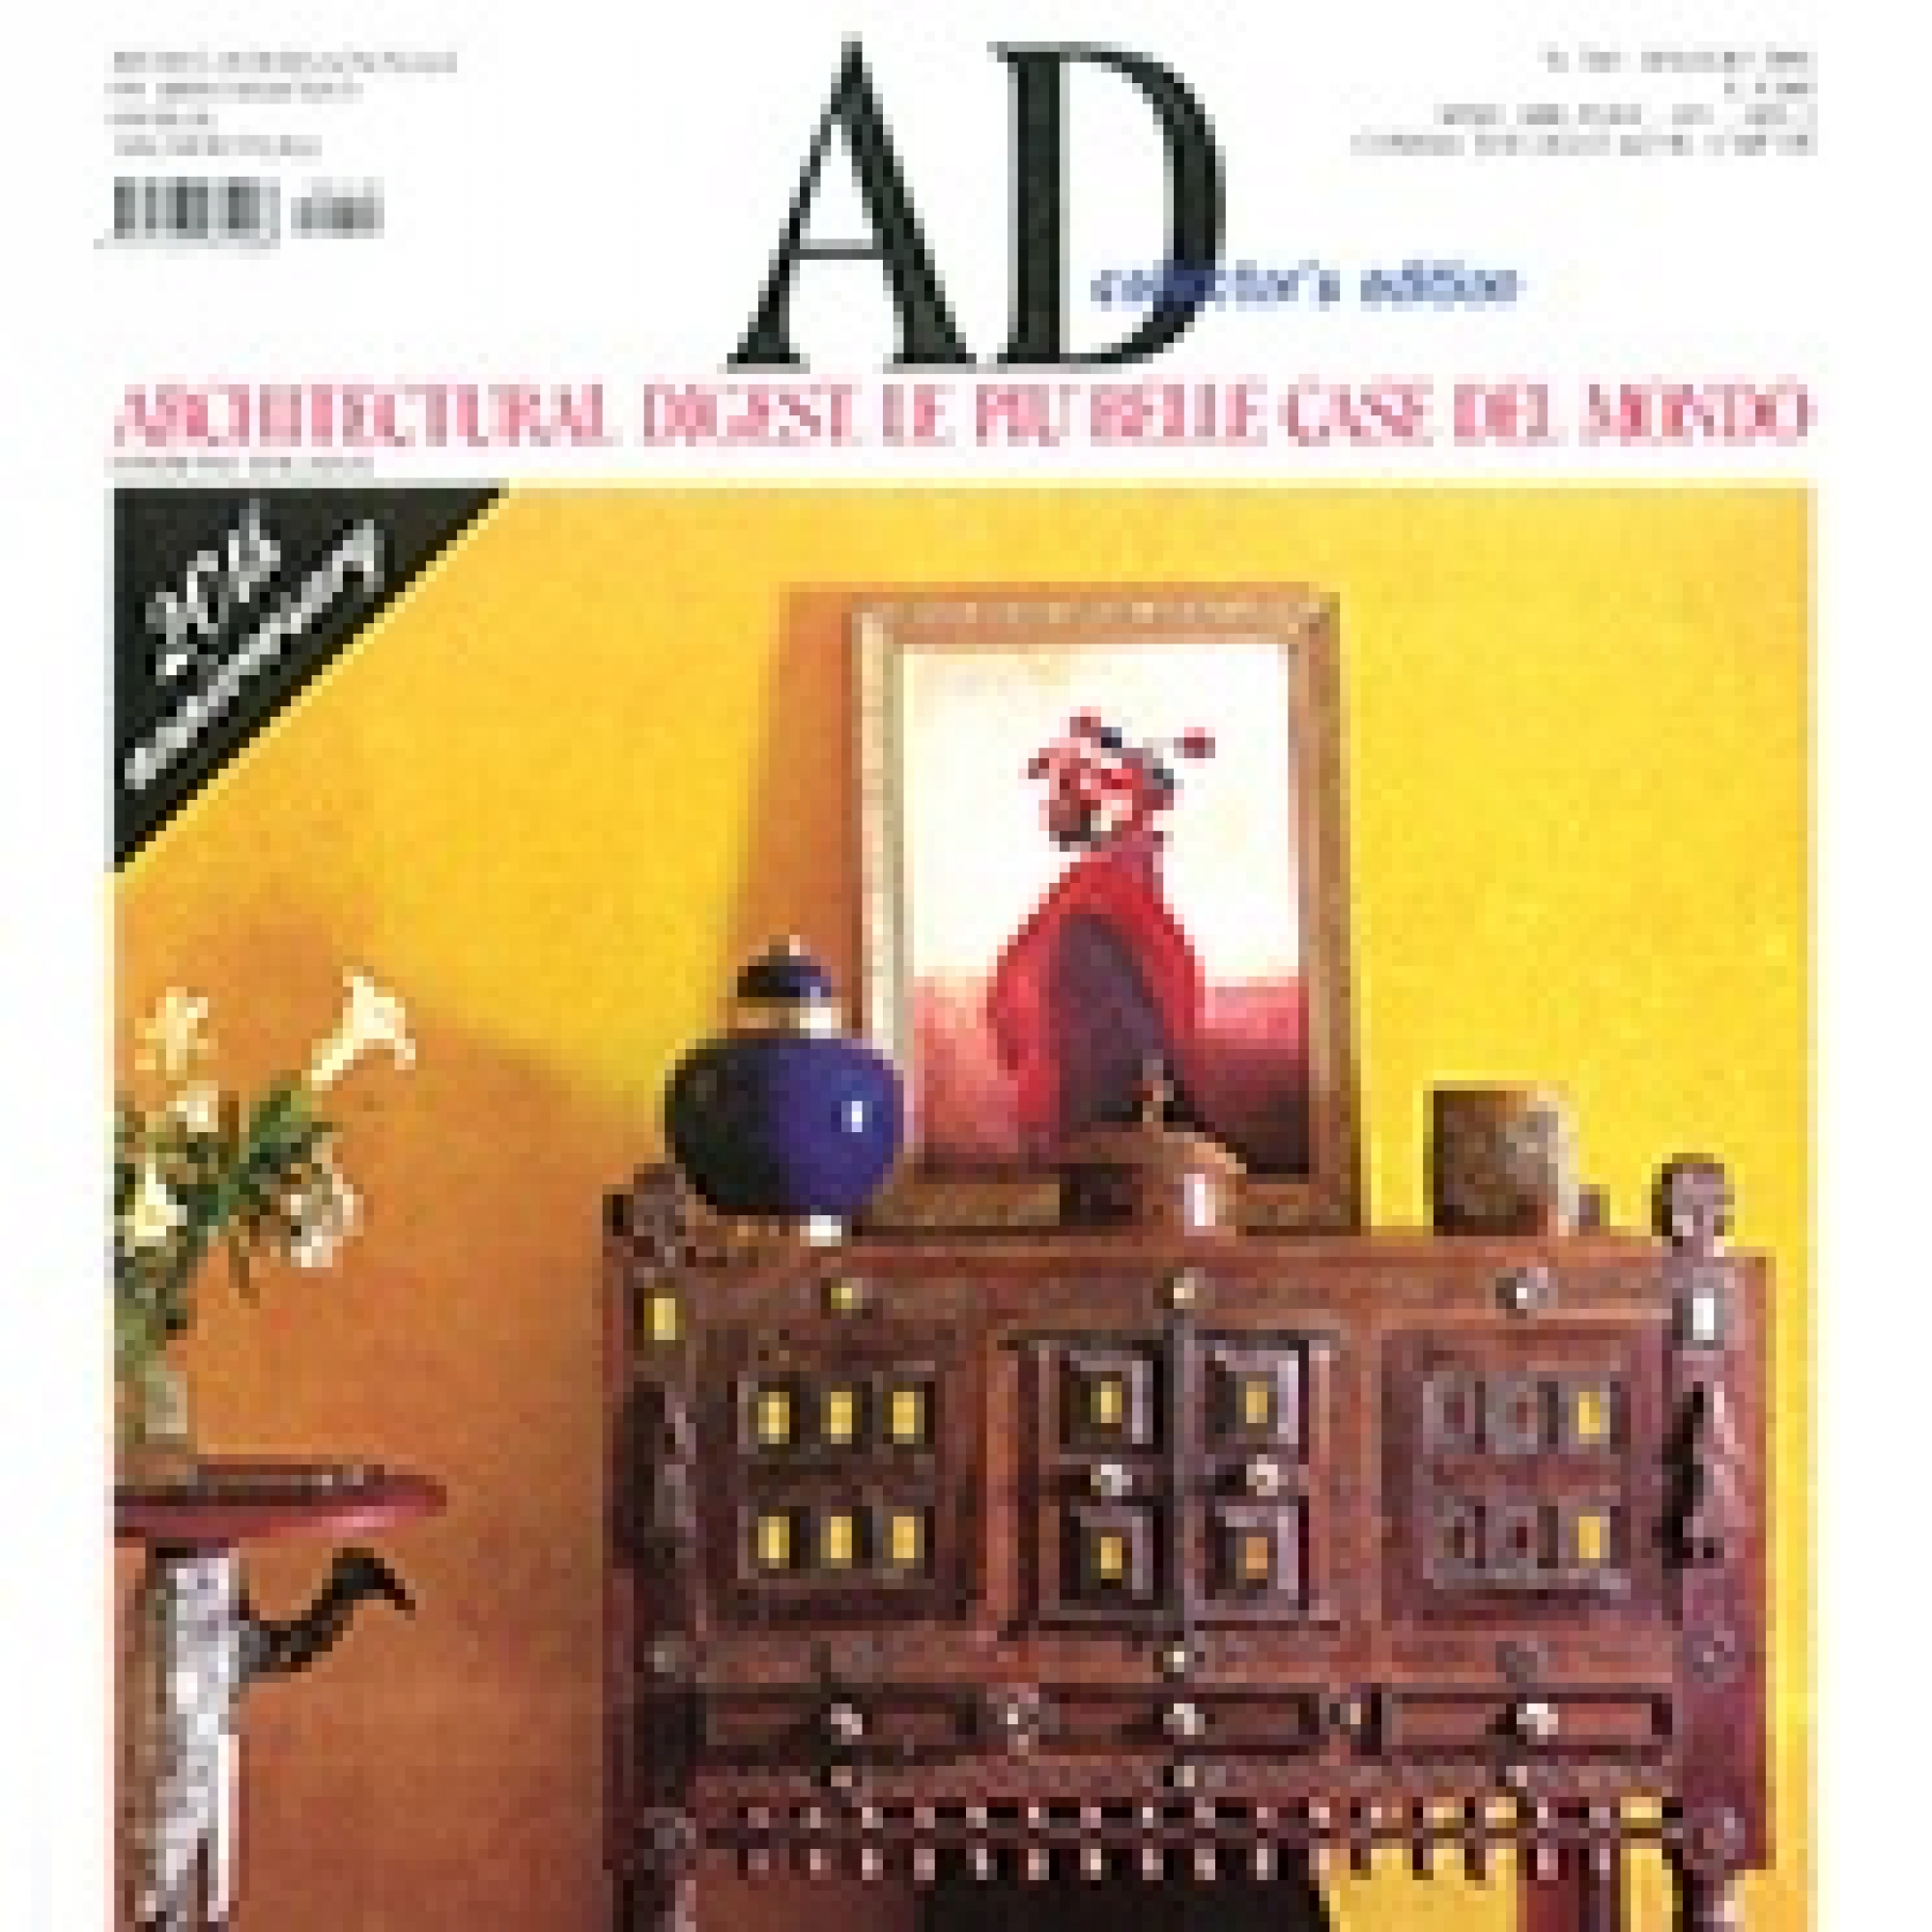 AD - Architectural Digest. Le case più belle del mondo